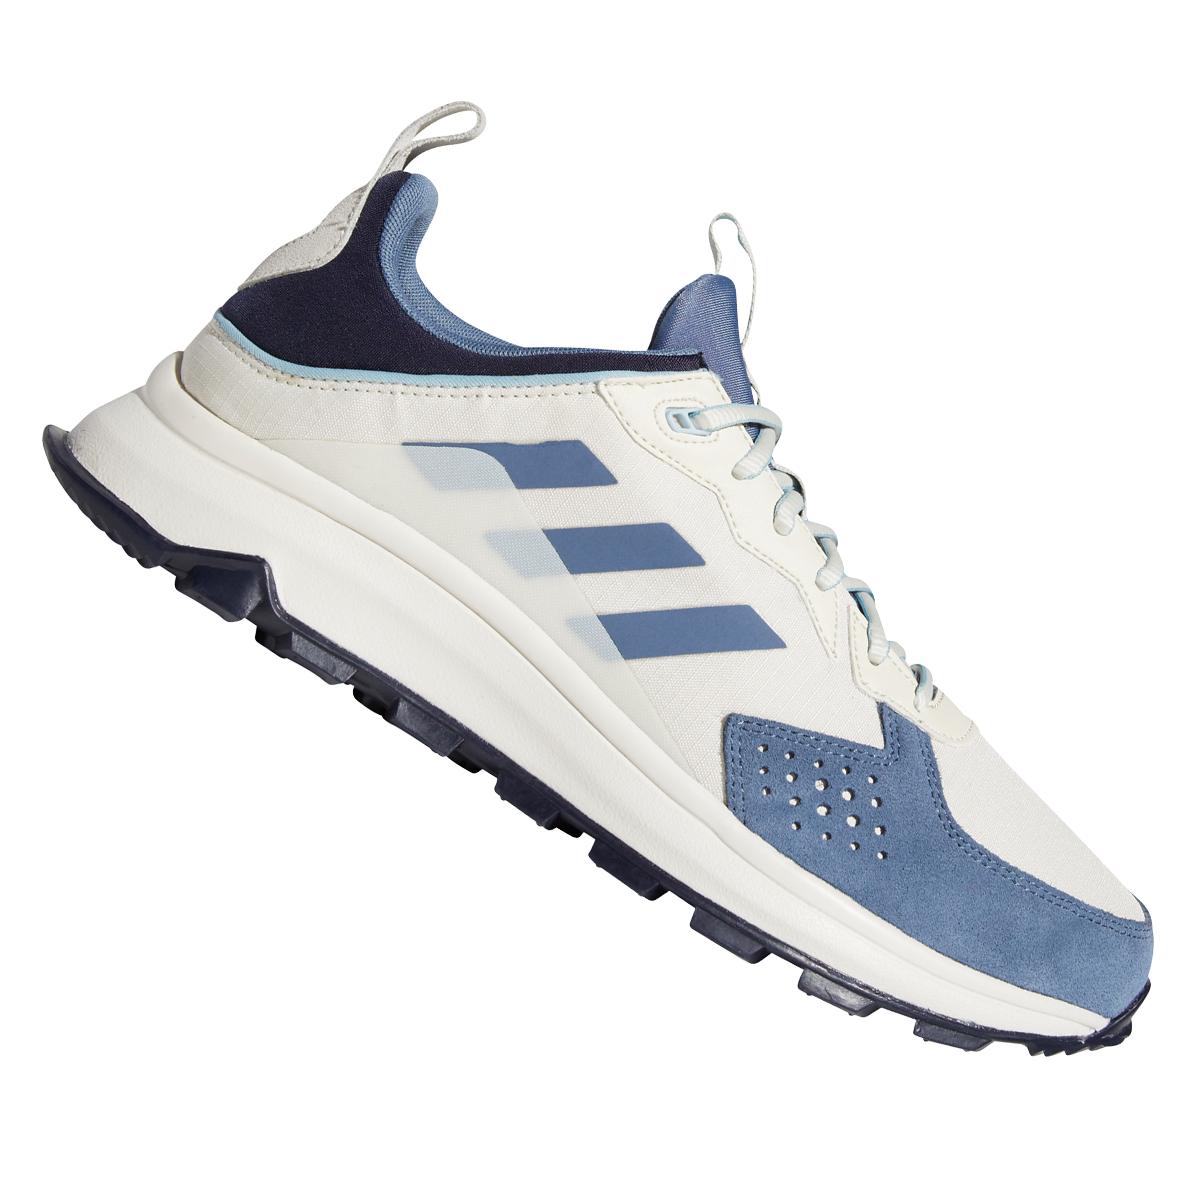 Adidas Laufschuh Response Trail weiß/hellblau (Gr. 39 1/3 - 49 1/3) für 39,95€